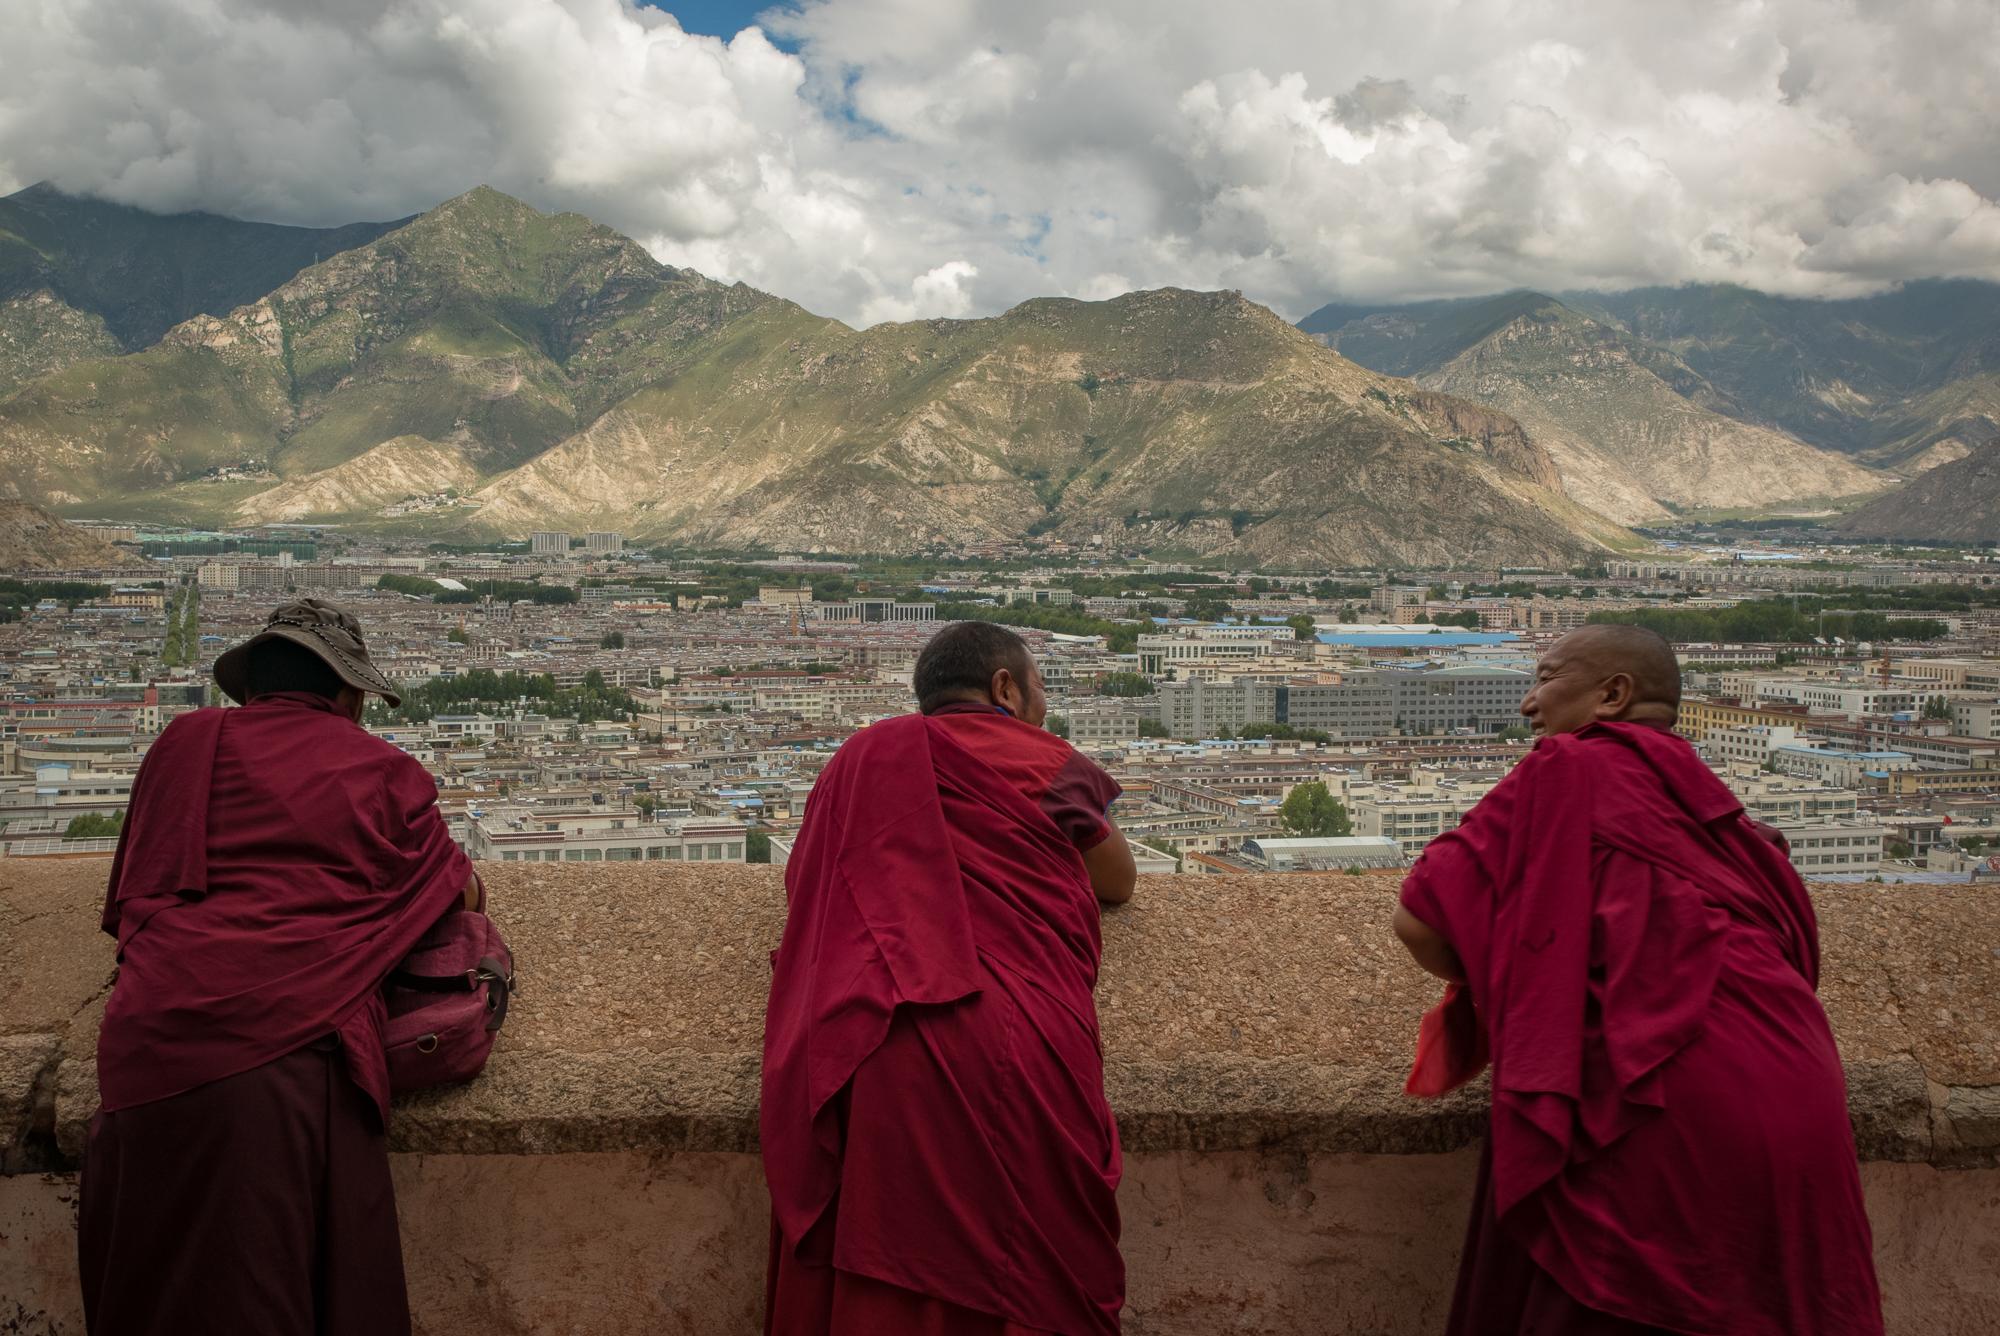 Lhasa-A7S-Photos-00296.jpg